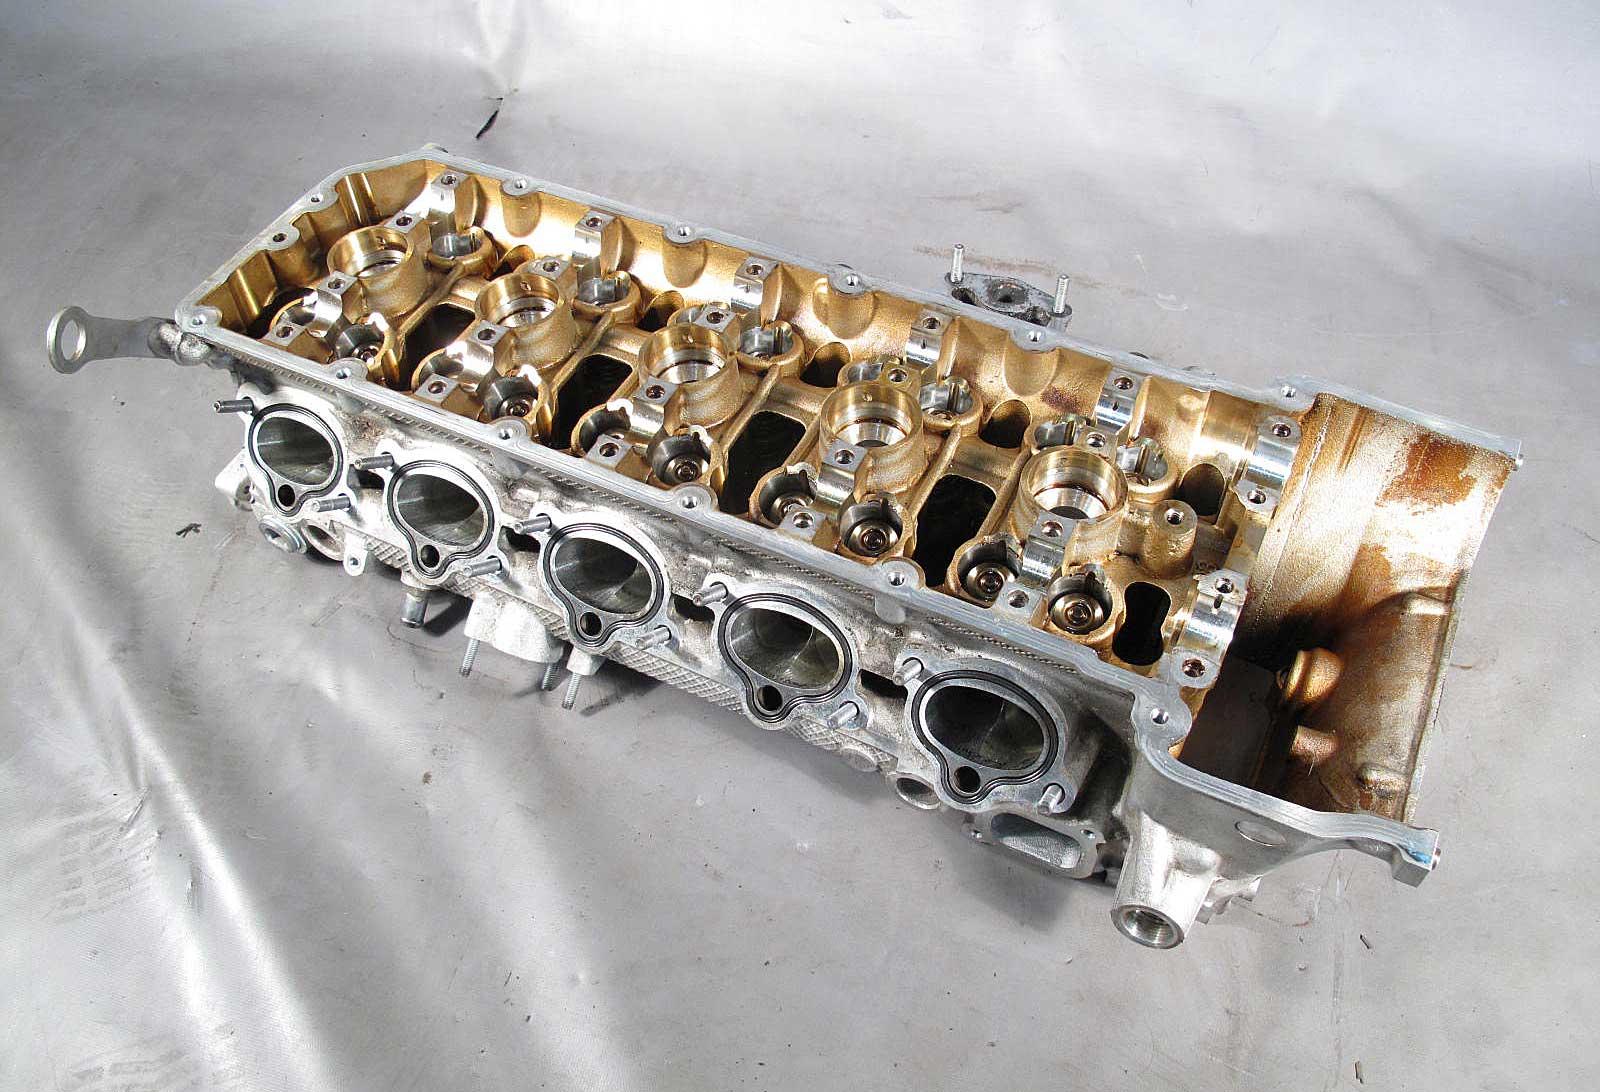 2010 Bmw M6 >> BMW S85 5.0L V10 M5 M6 Cylinder Head Bank 2 Left 115k w